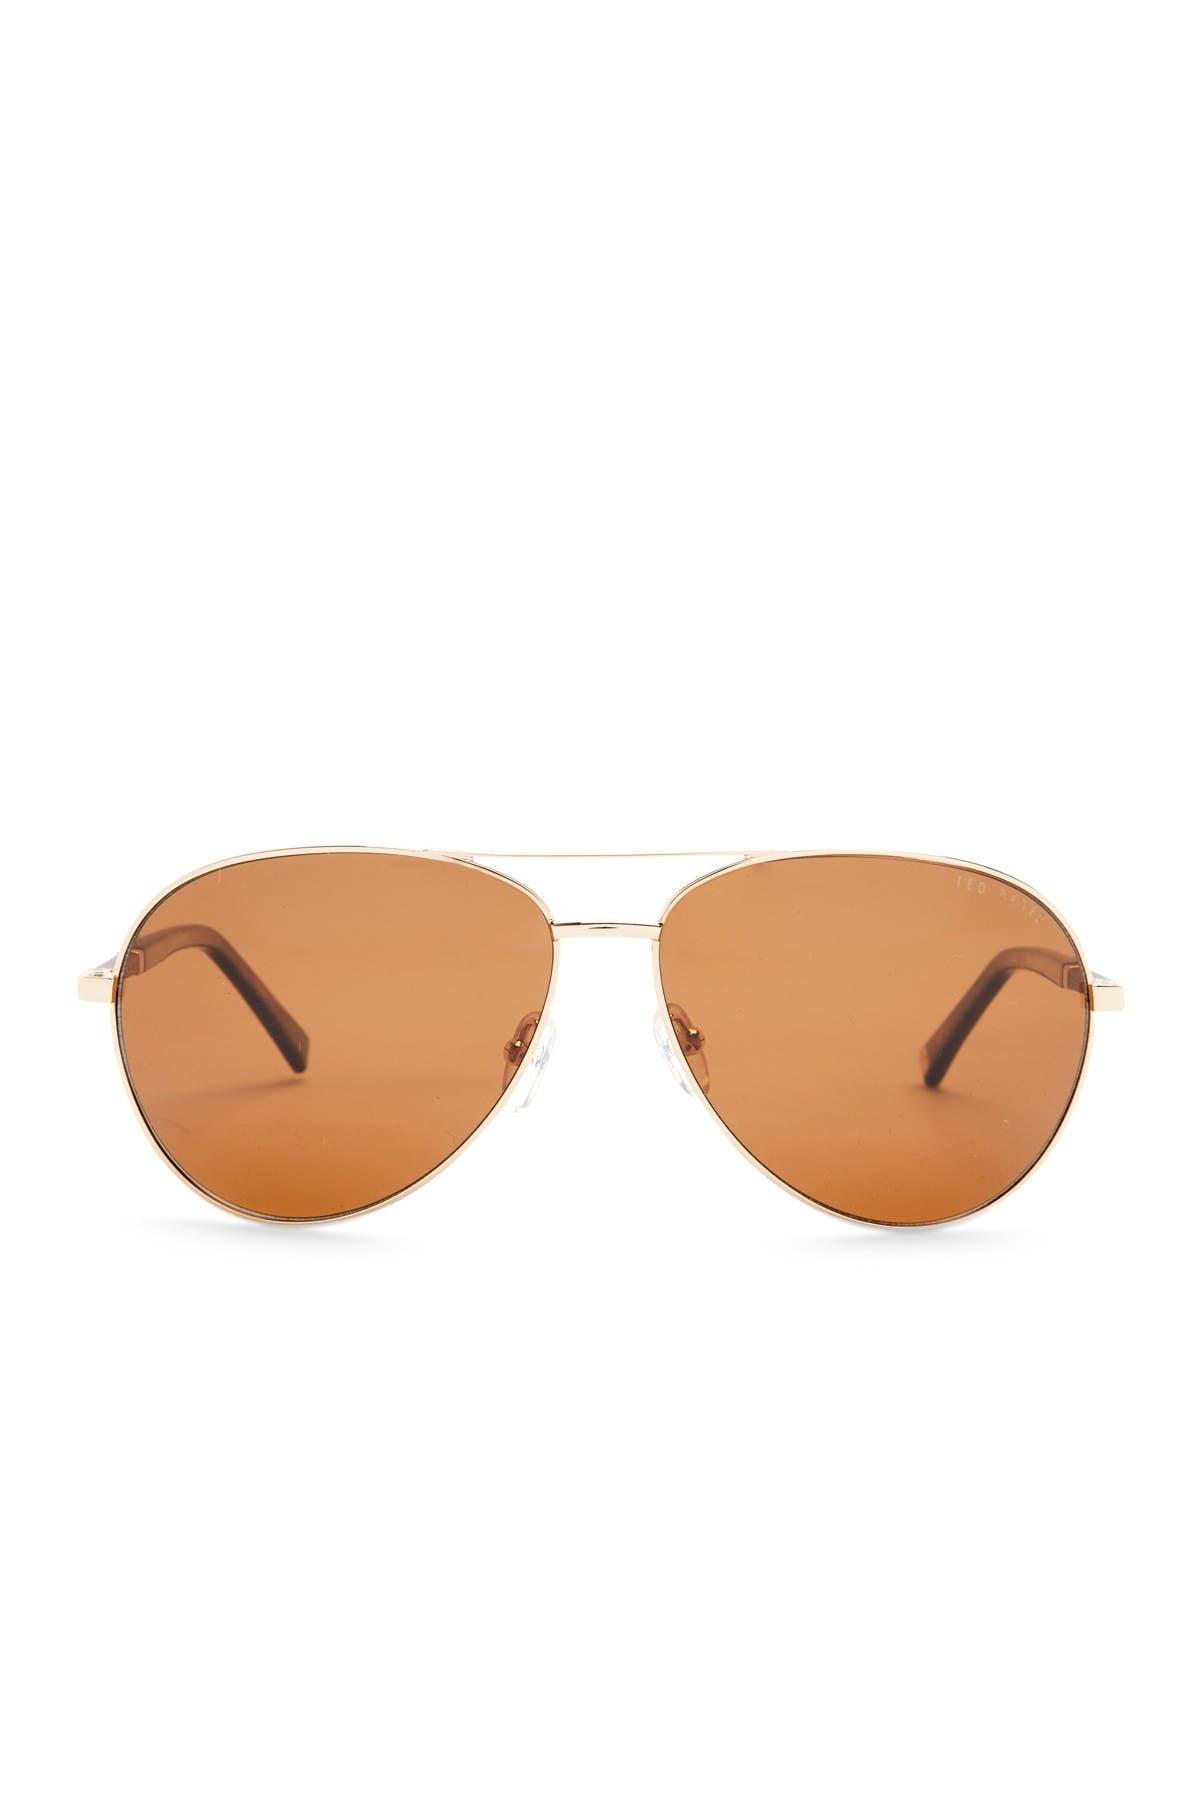 Image of Ted Baker London 62mm Aviator Sunglasses